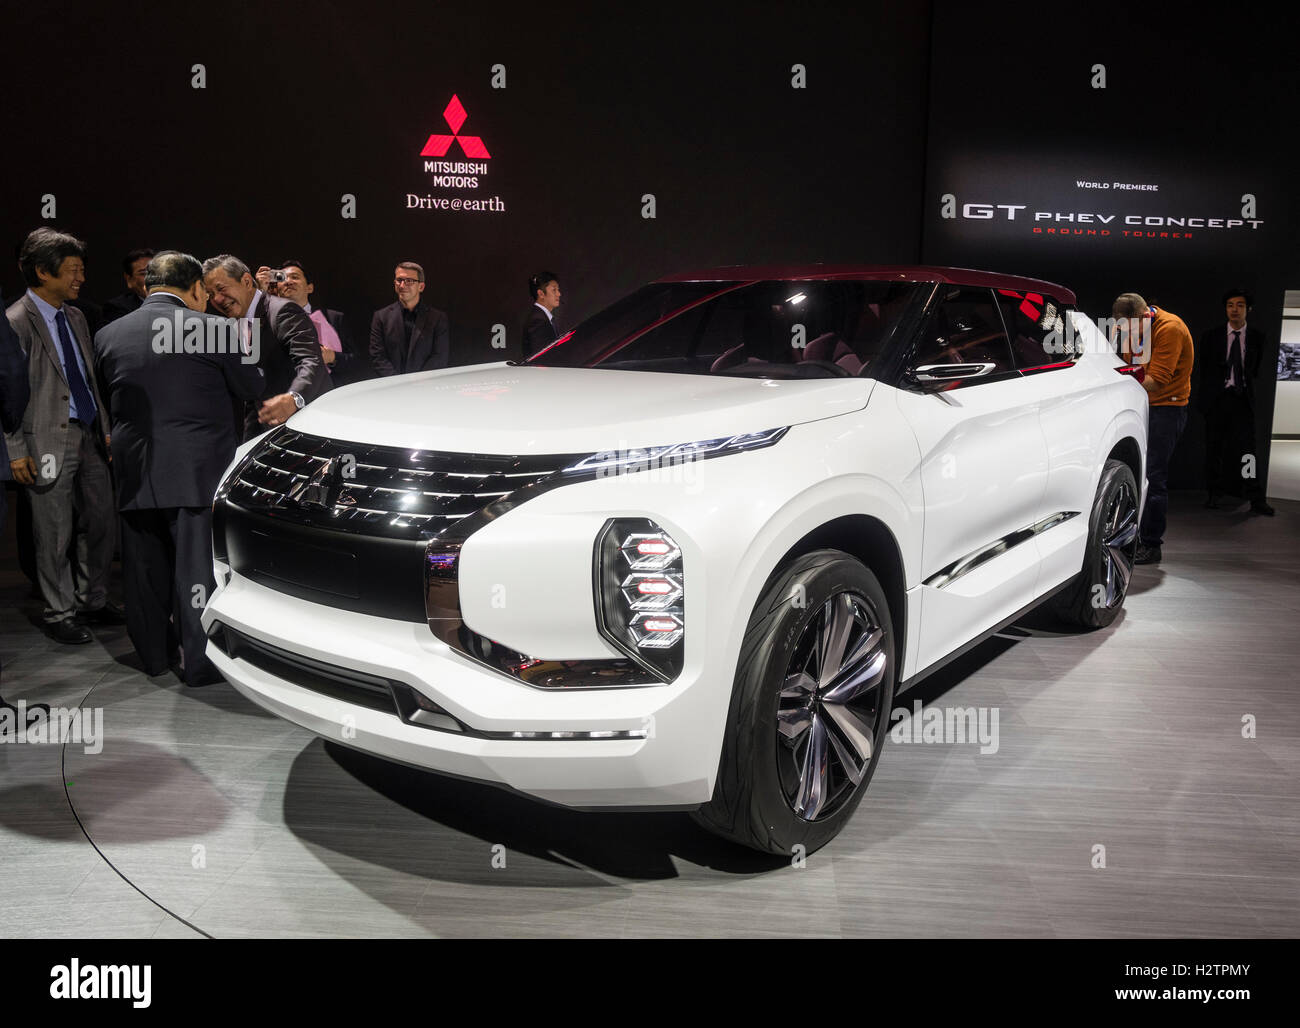 Mitsubishi GT PHEV Konzept SUV auf der Paris Motor Show 2016 Stockbild